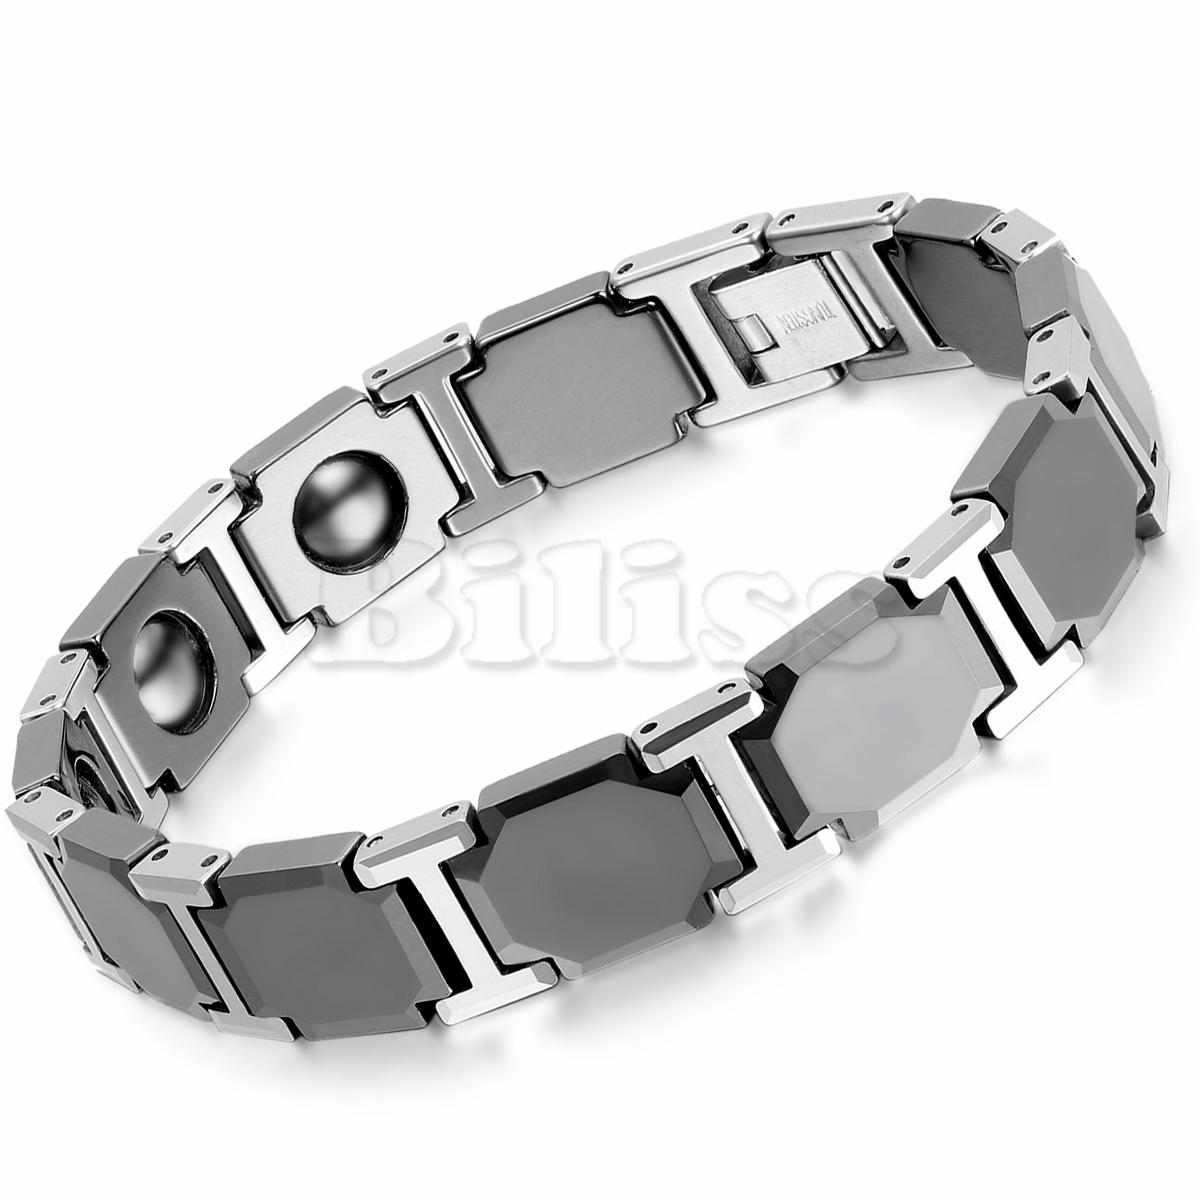 20cm Black Ceramic Bracelet Bioenergy Bangle Magnetic Germanium Health Chain Tungsten Men Bracelet Fashion Jewelry(China (Mainland))